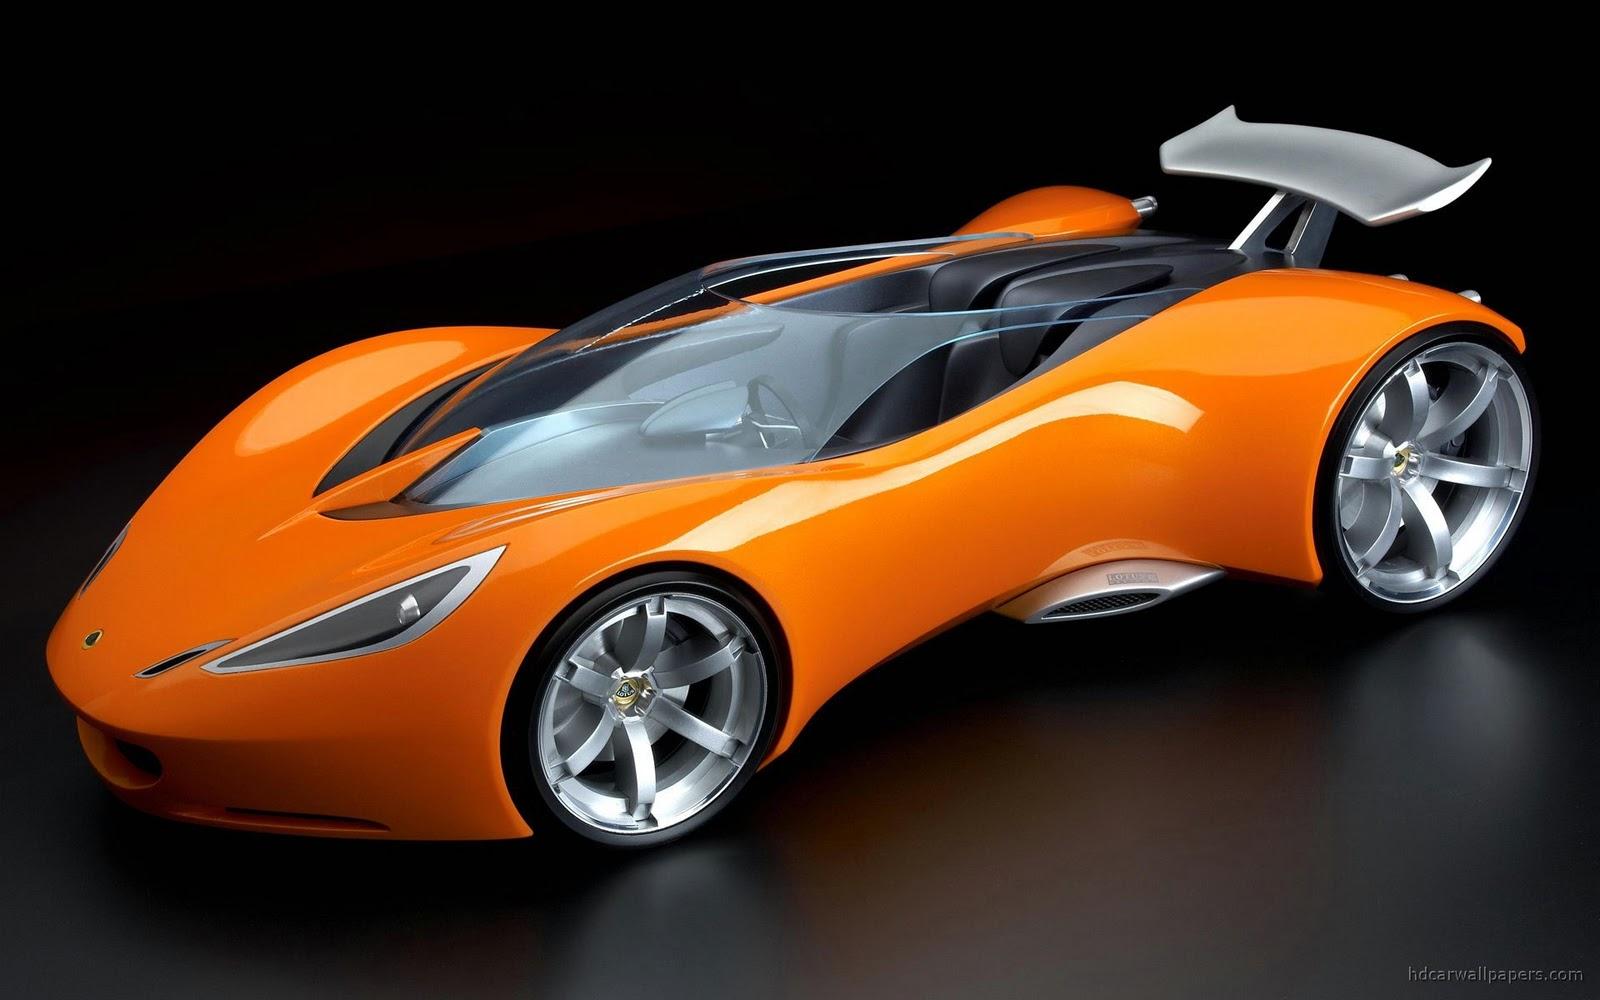 http://1.bp.blogspot.com/-dtSlVj9WJU8/TZazJuQZJLI/AAAAAAAAAi8/pHJRes0NSNk/s1600/lotus_hot_wheels_concept-wide.jpg